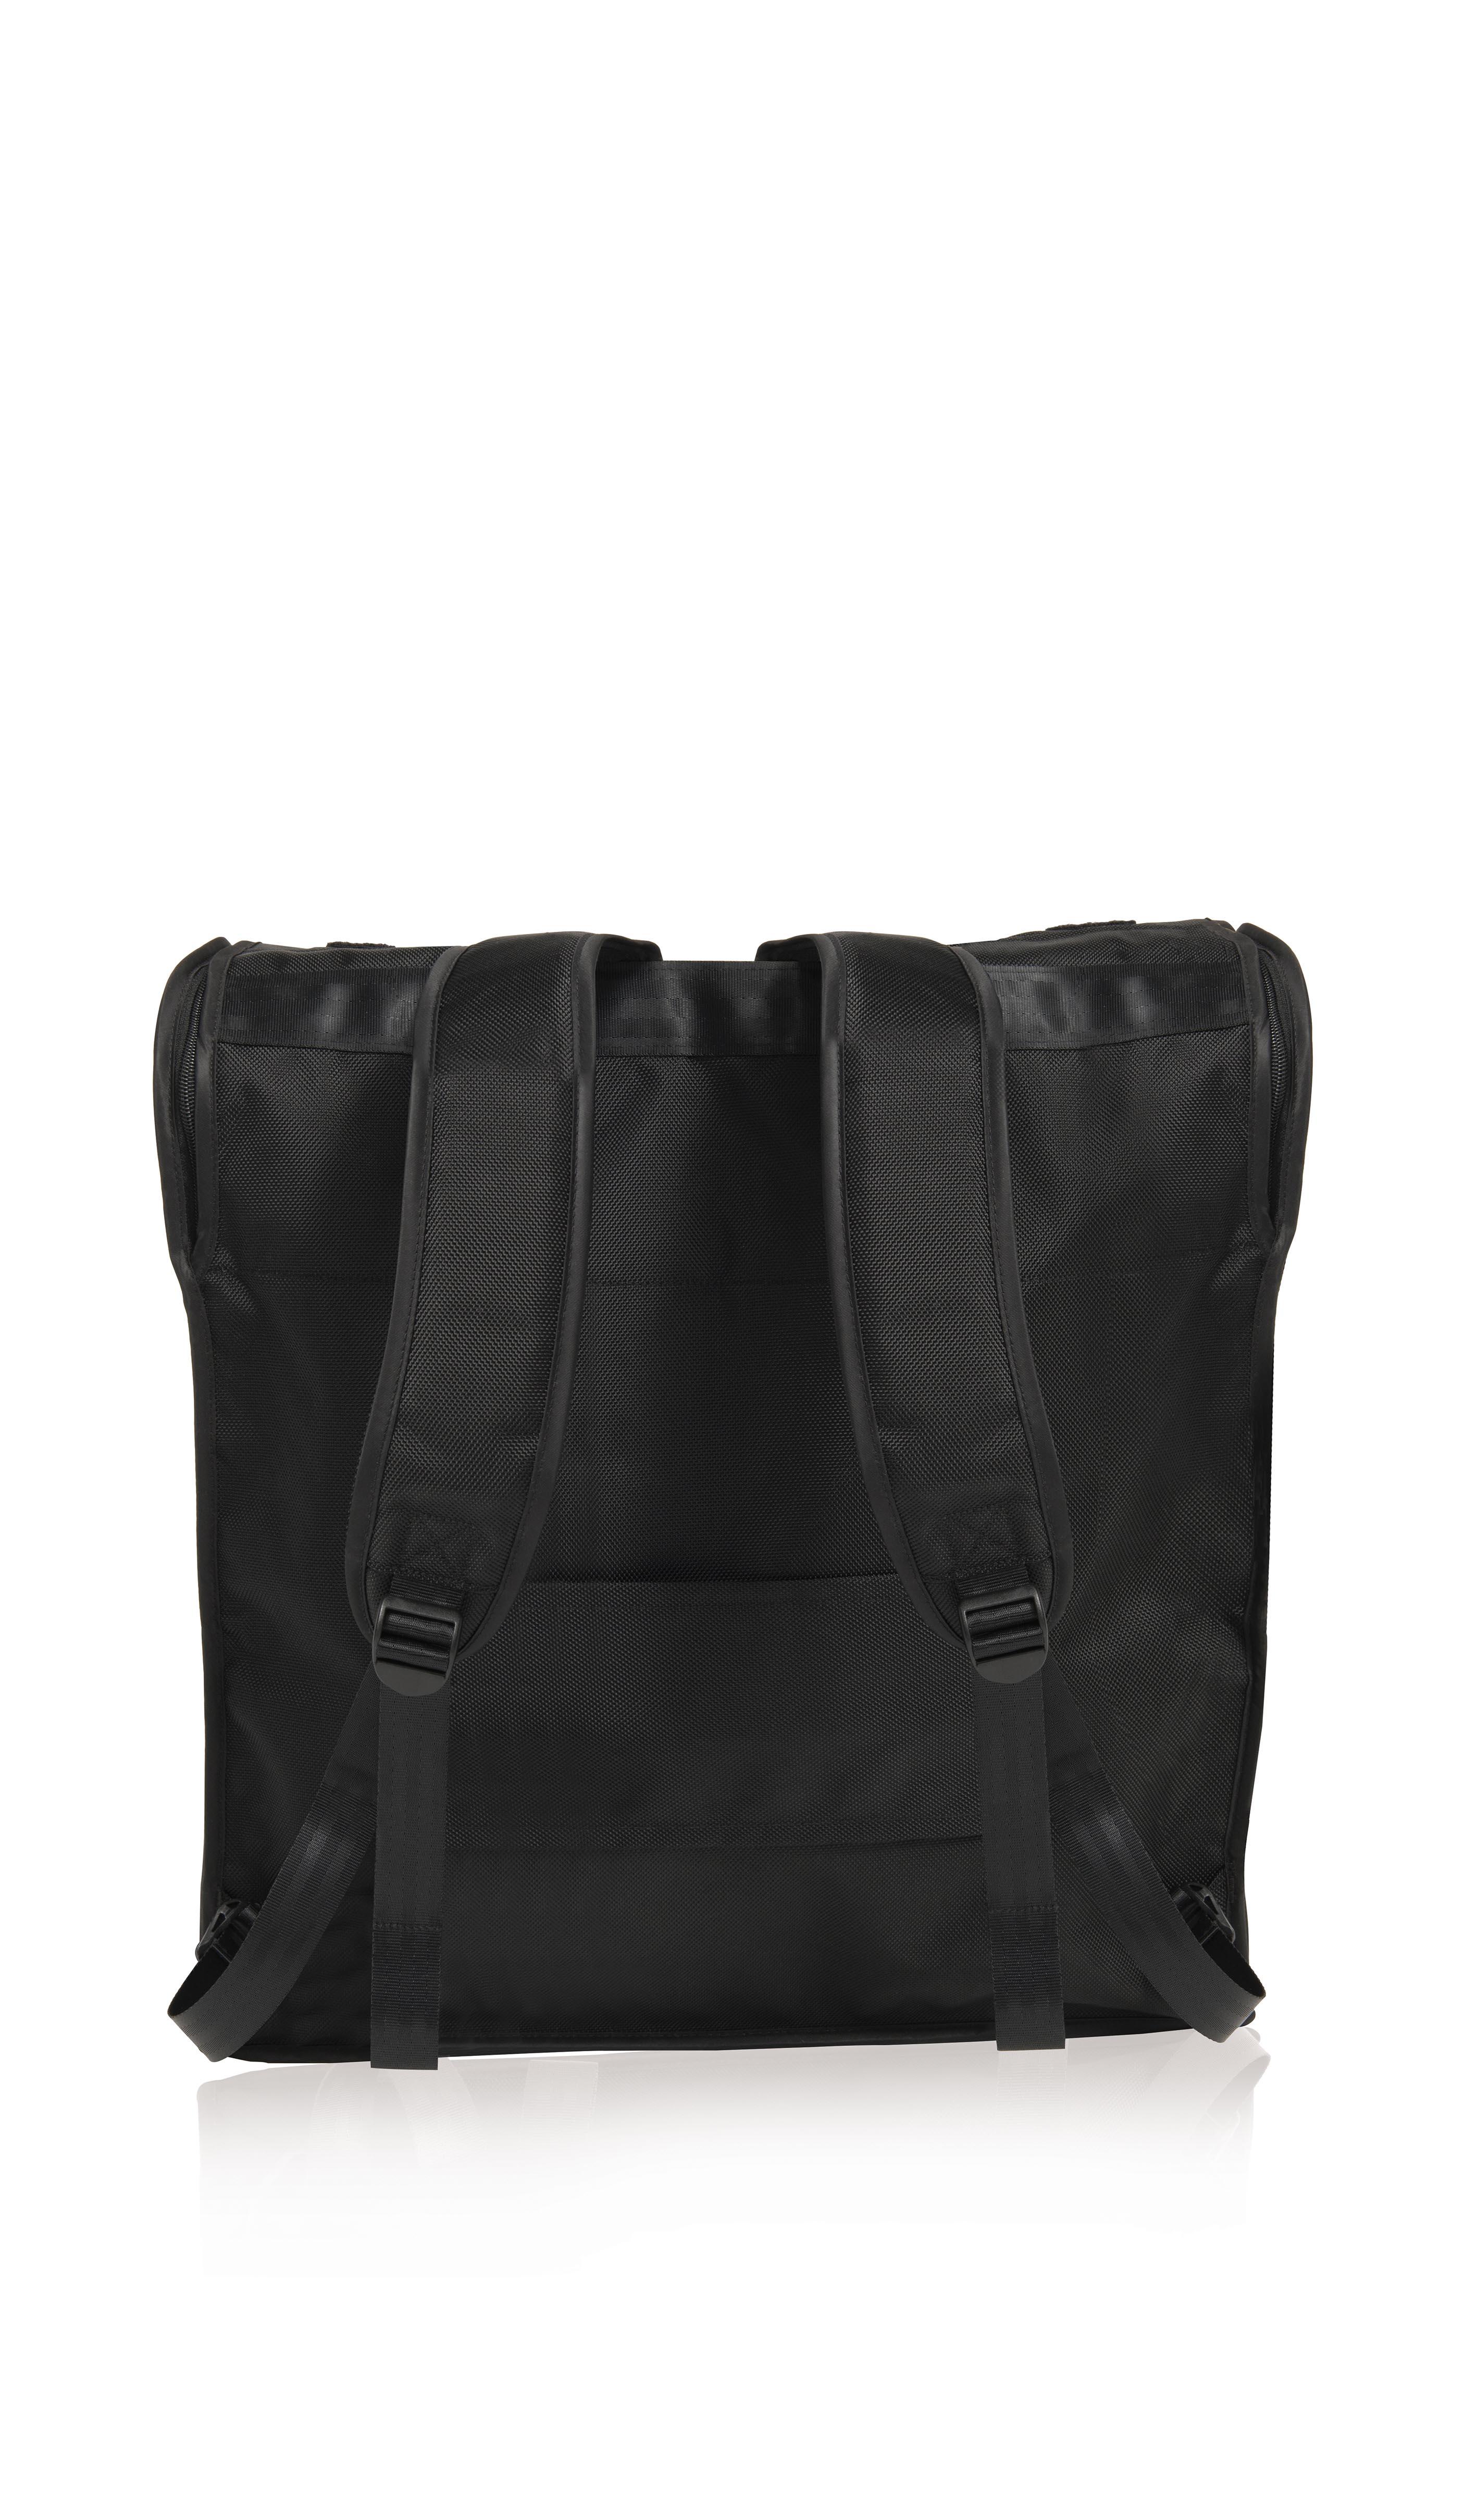 Babyzen travel bag